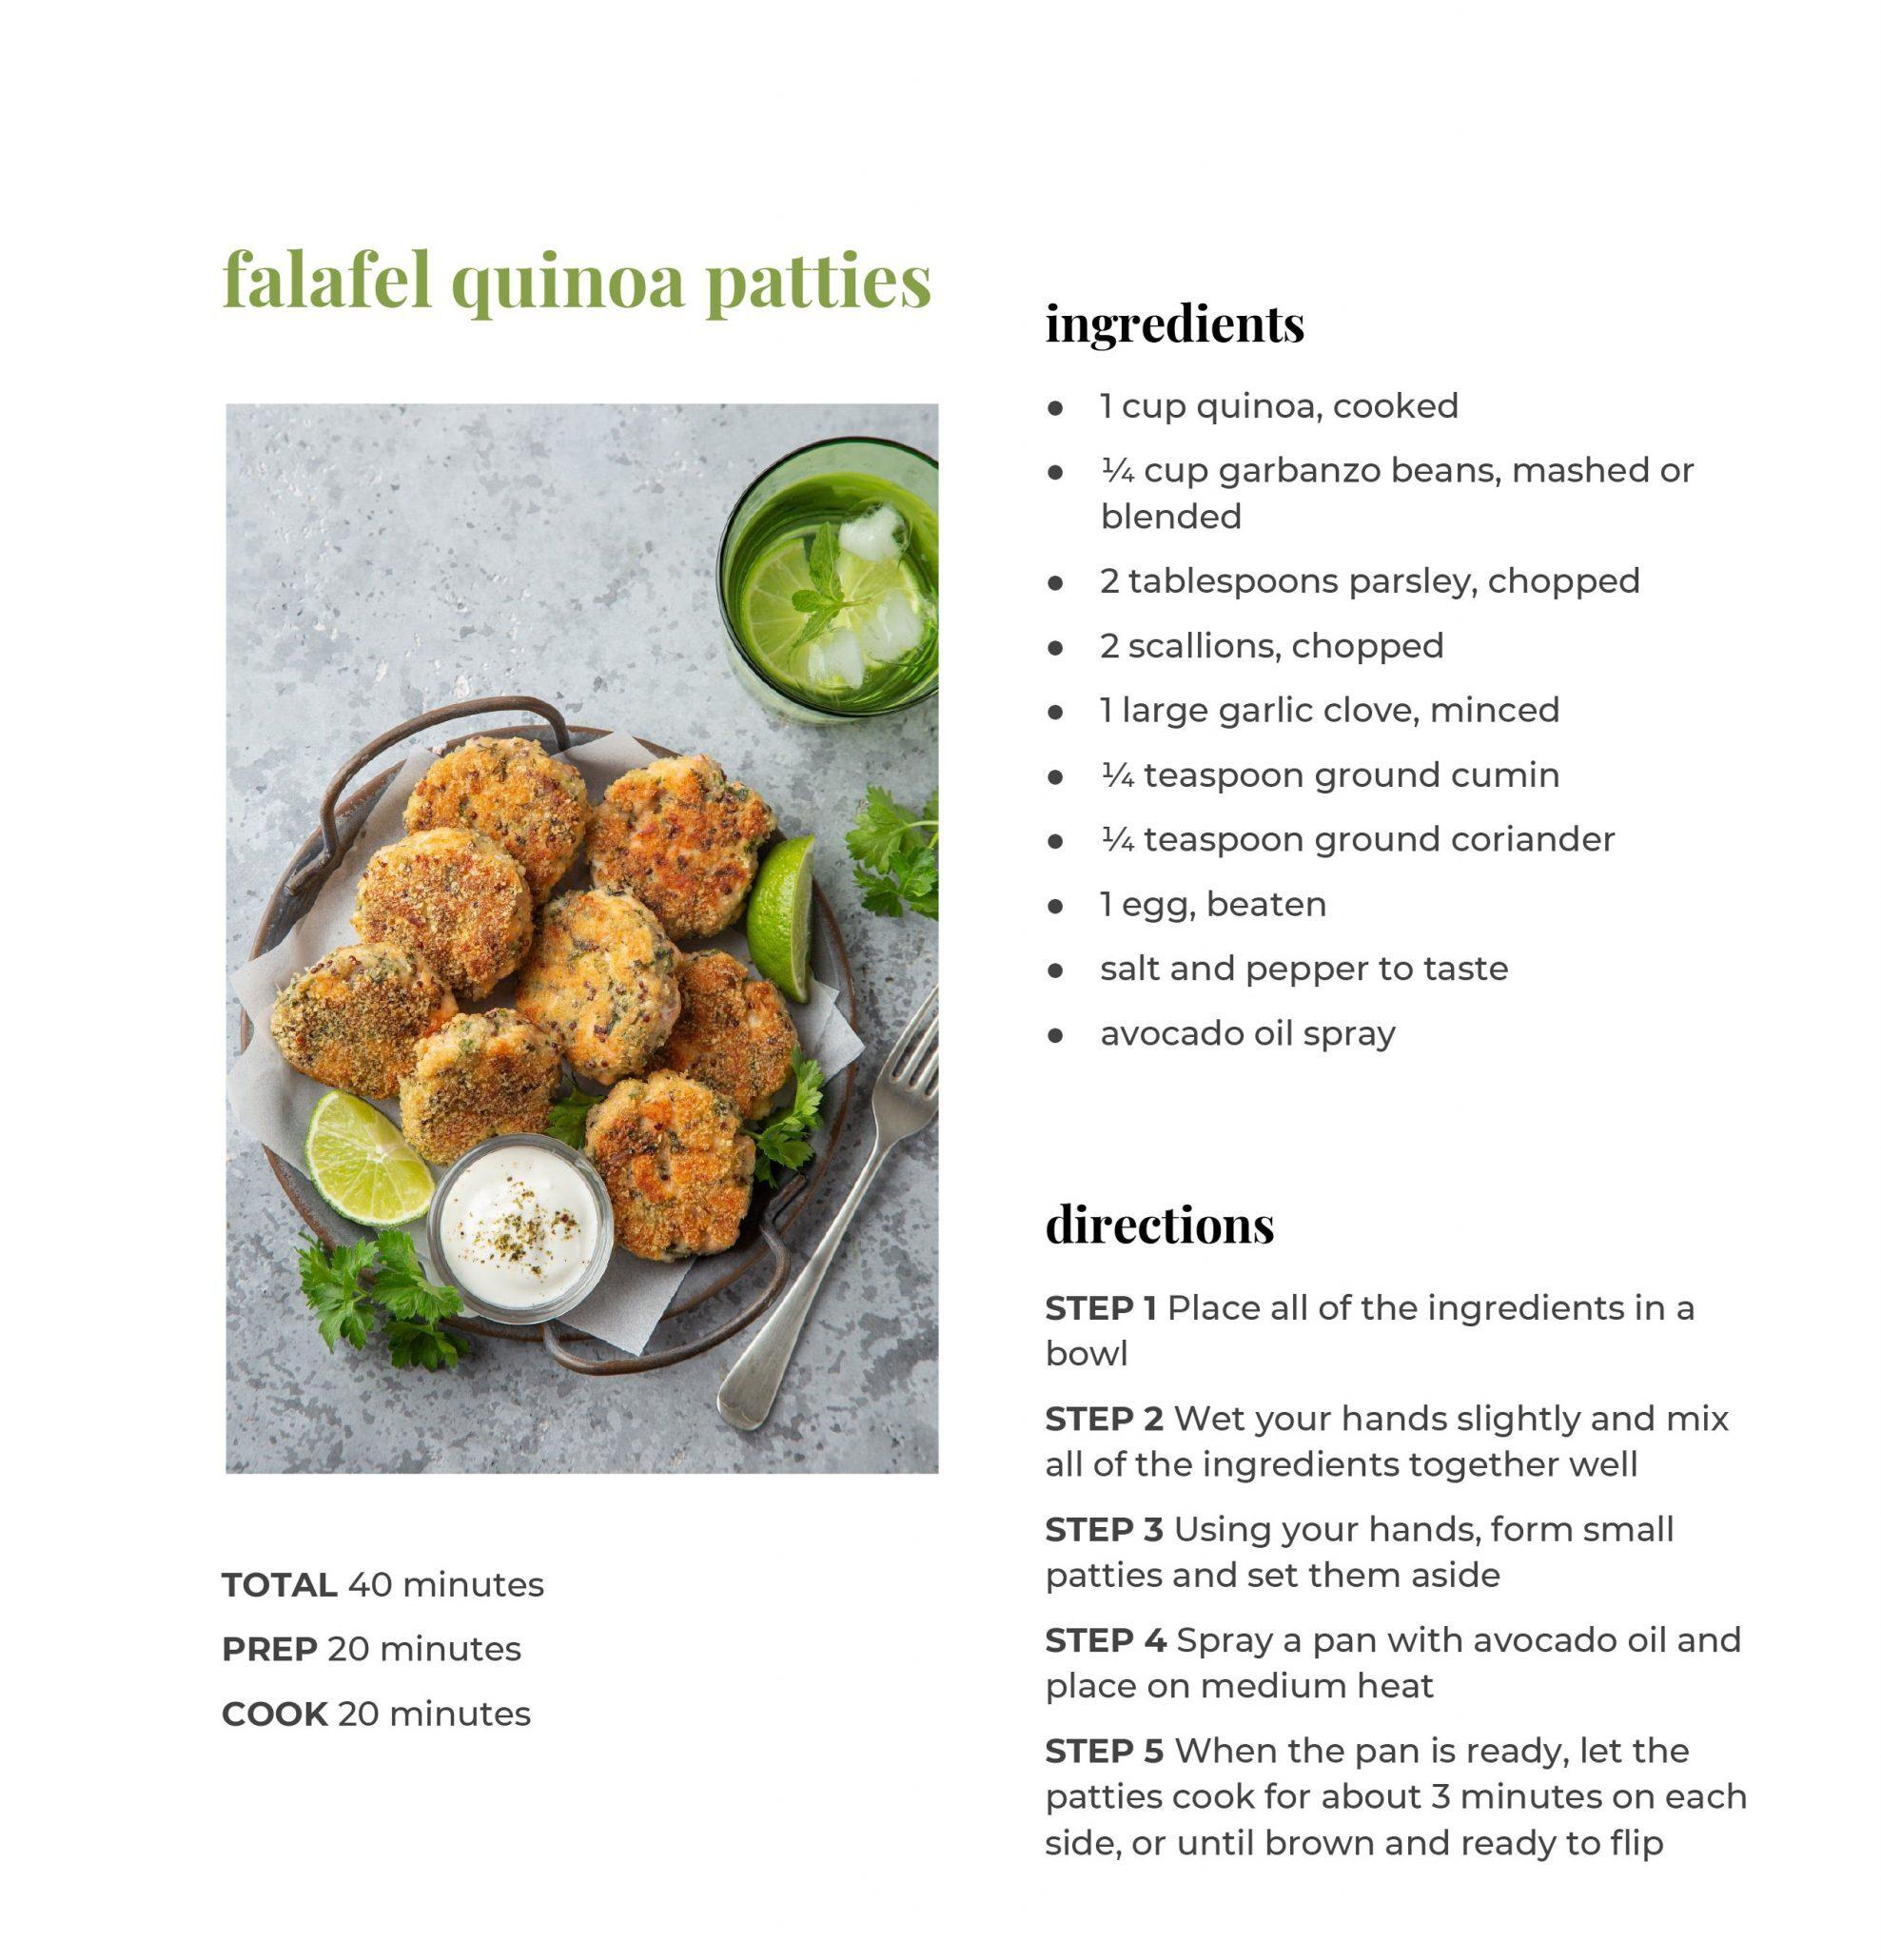 Falafel Quinoa Patties Recipe